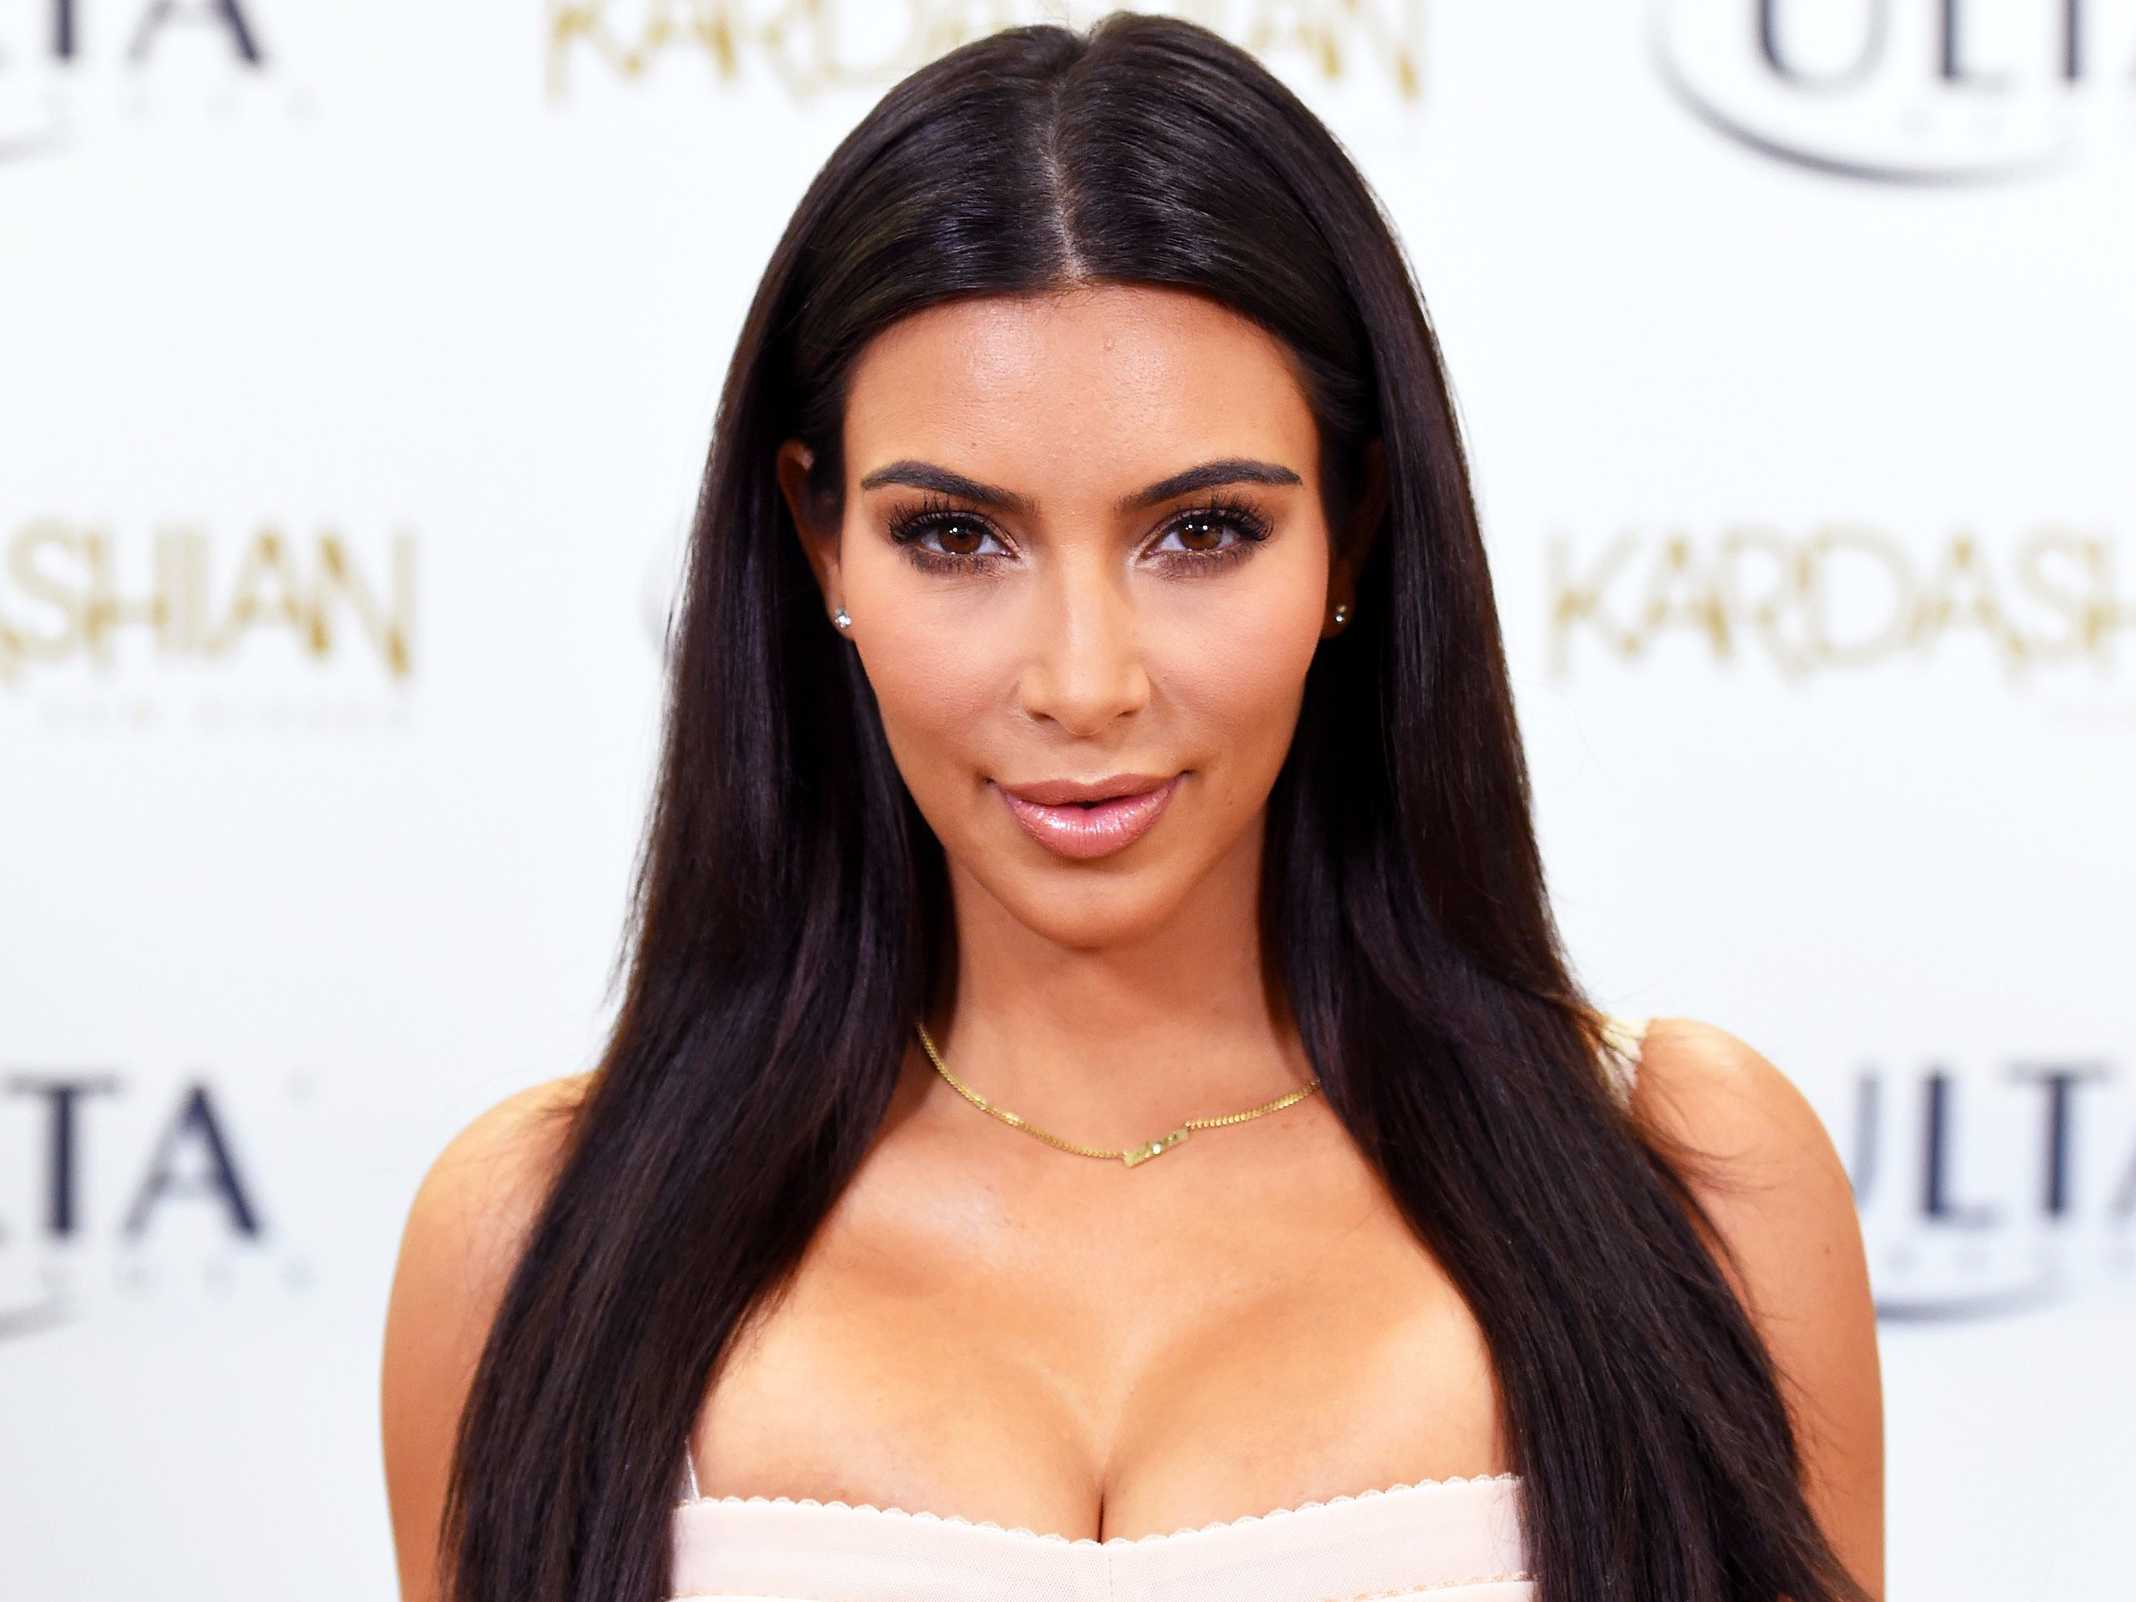 kim kardashian, hd photo